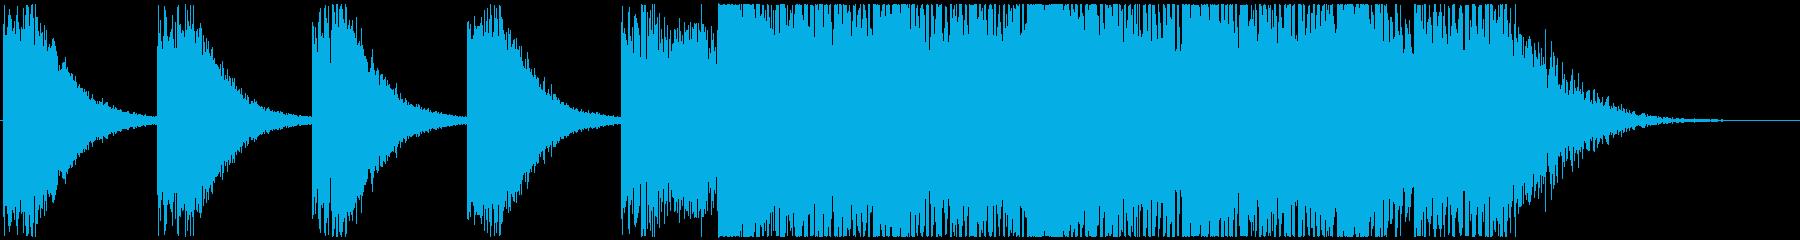 Damage IVの再生済みの波形